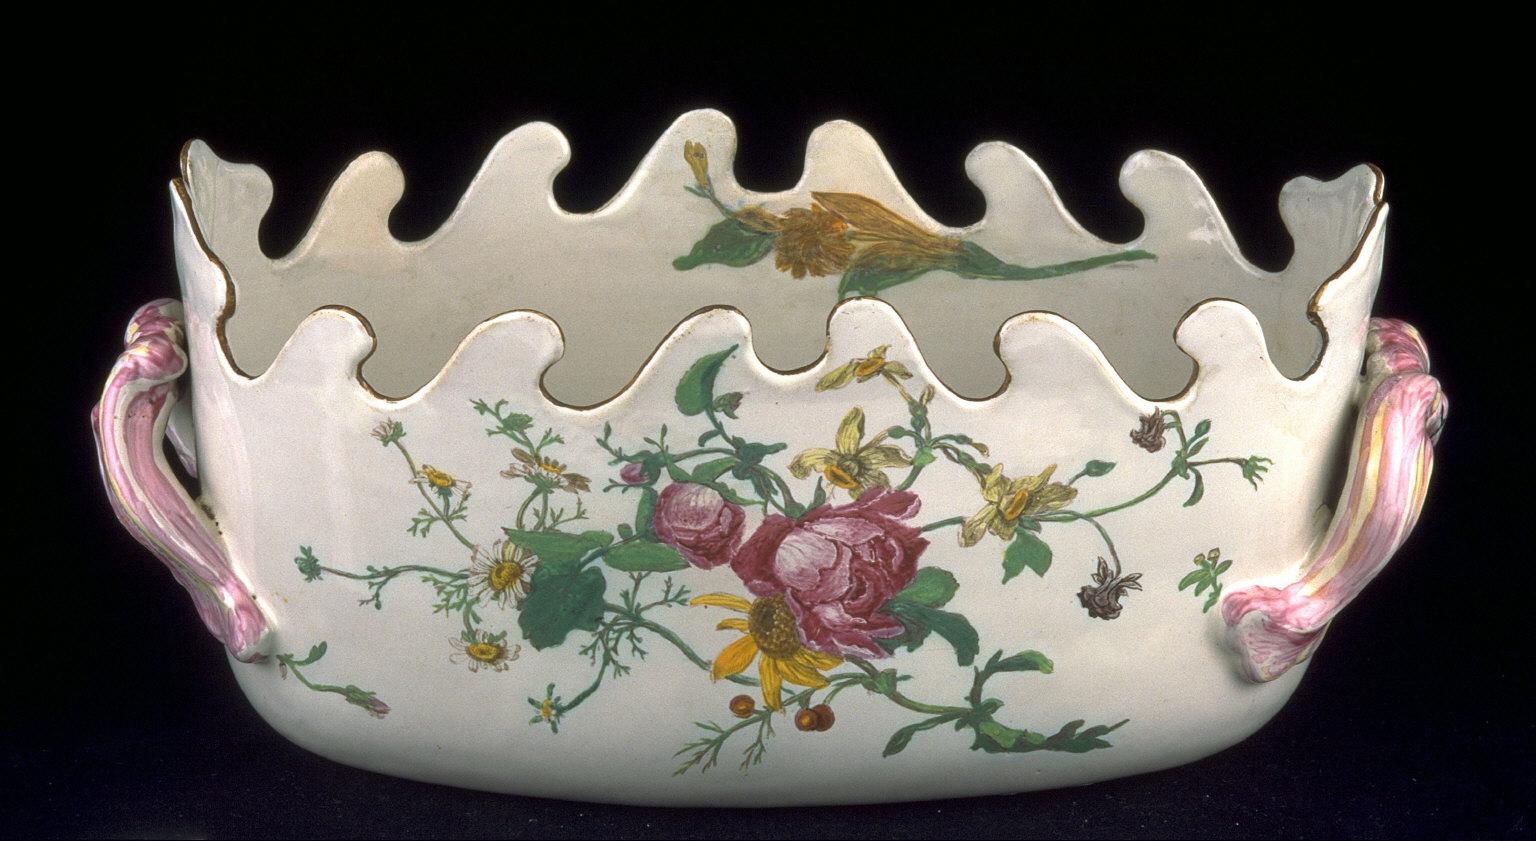 Verrier (deep bowl with handles)